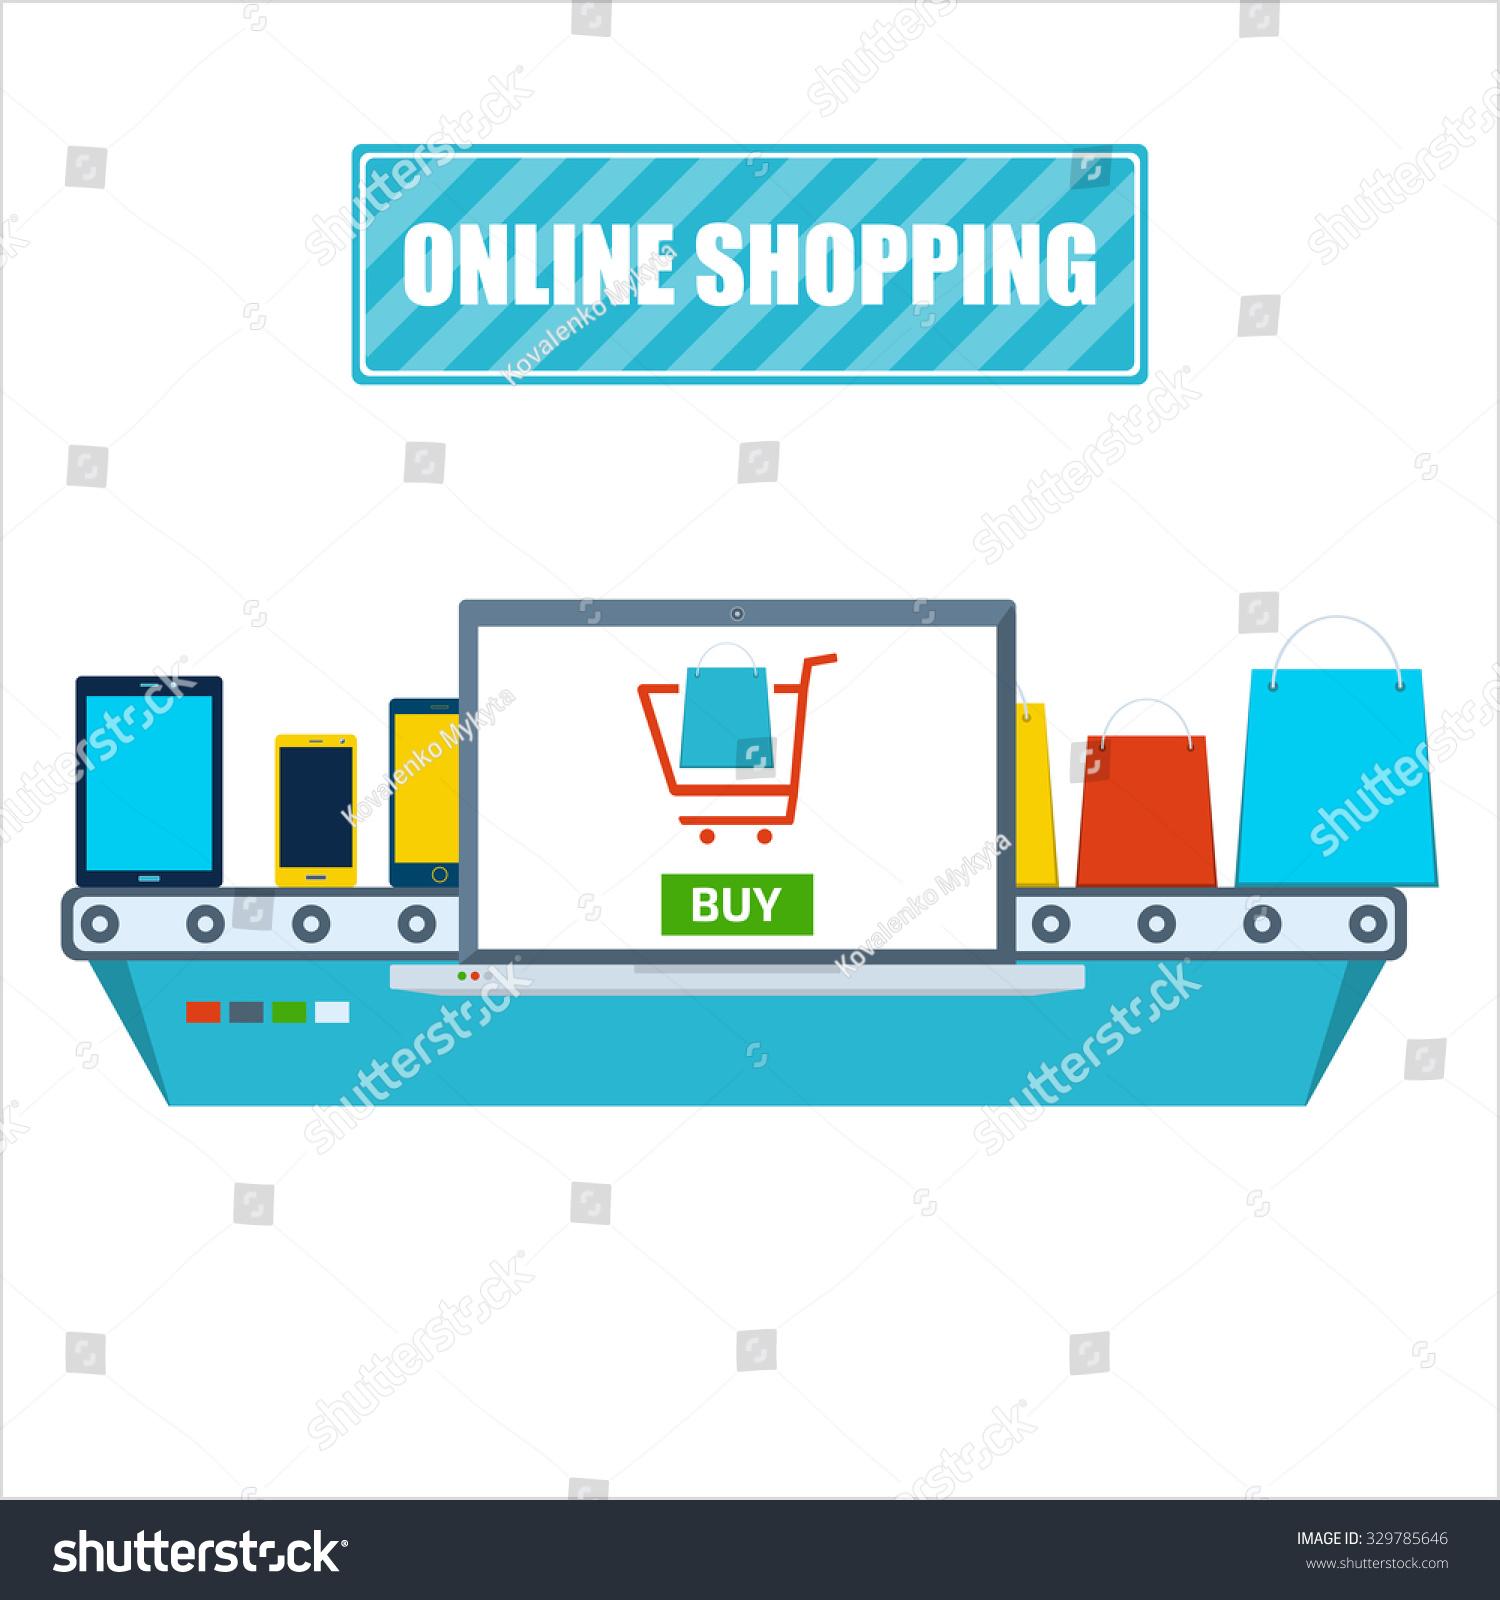 Online Shopping Process Flat Design Vector Stock Vector HD (Royalty ...